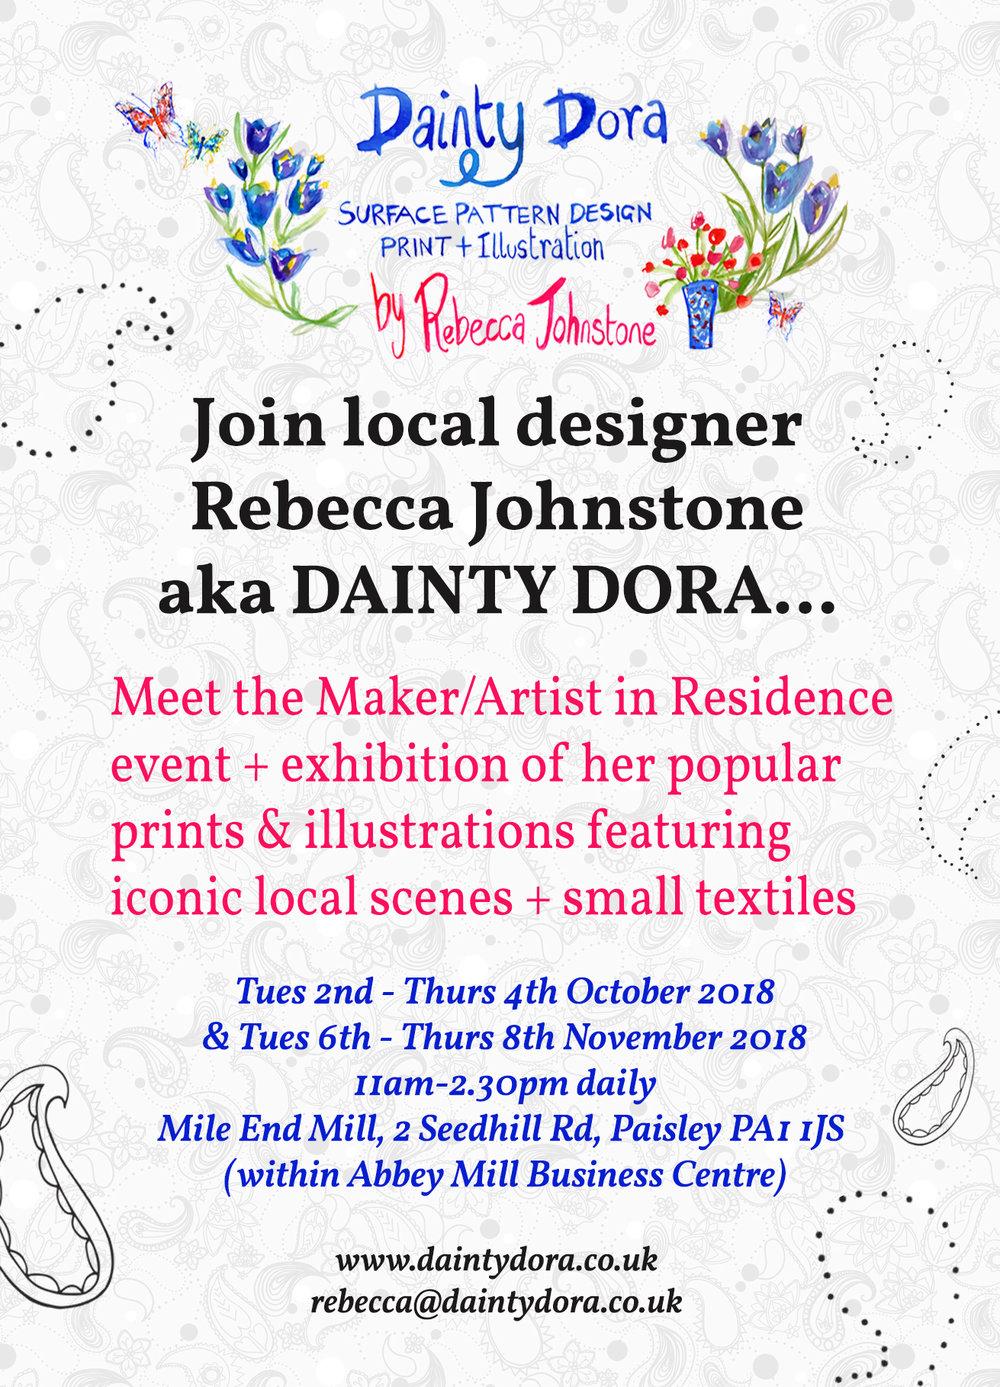 Mile End Mill artist in residence exhibition event, Rebecca Johnstone aka Dainty Dora